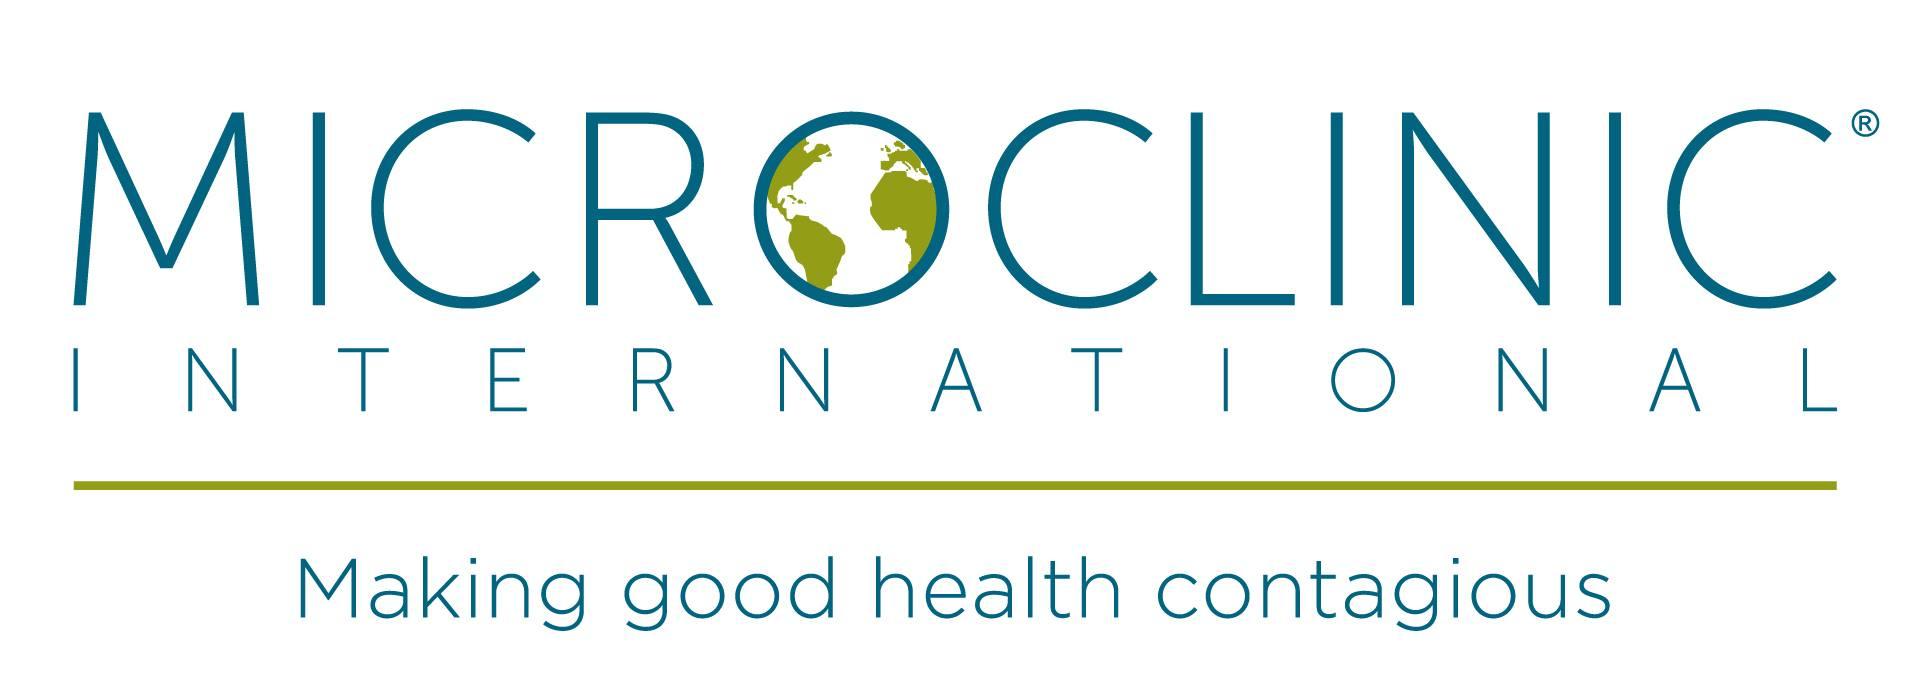 Microclinic International